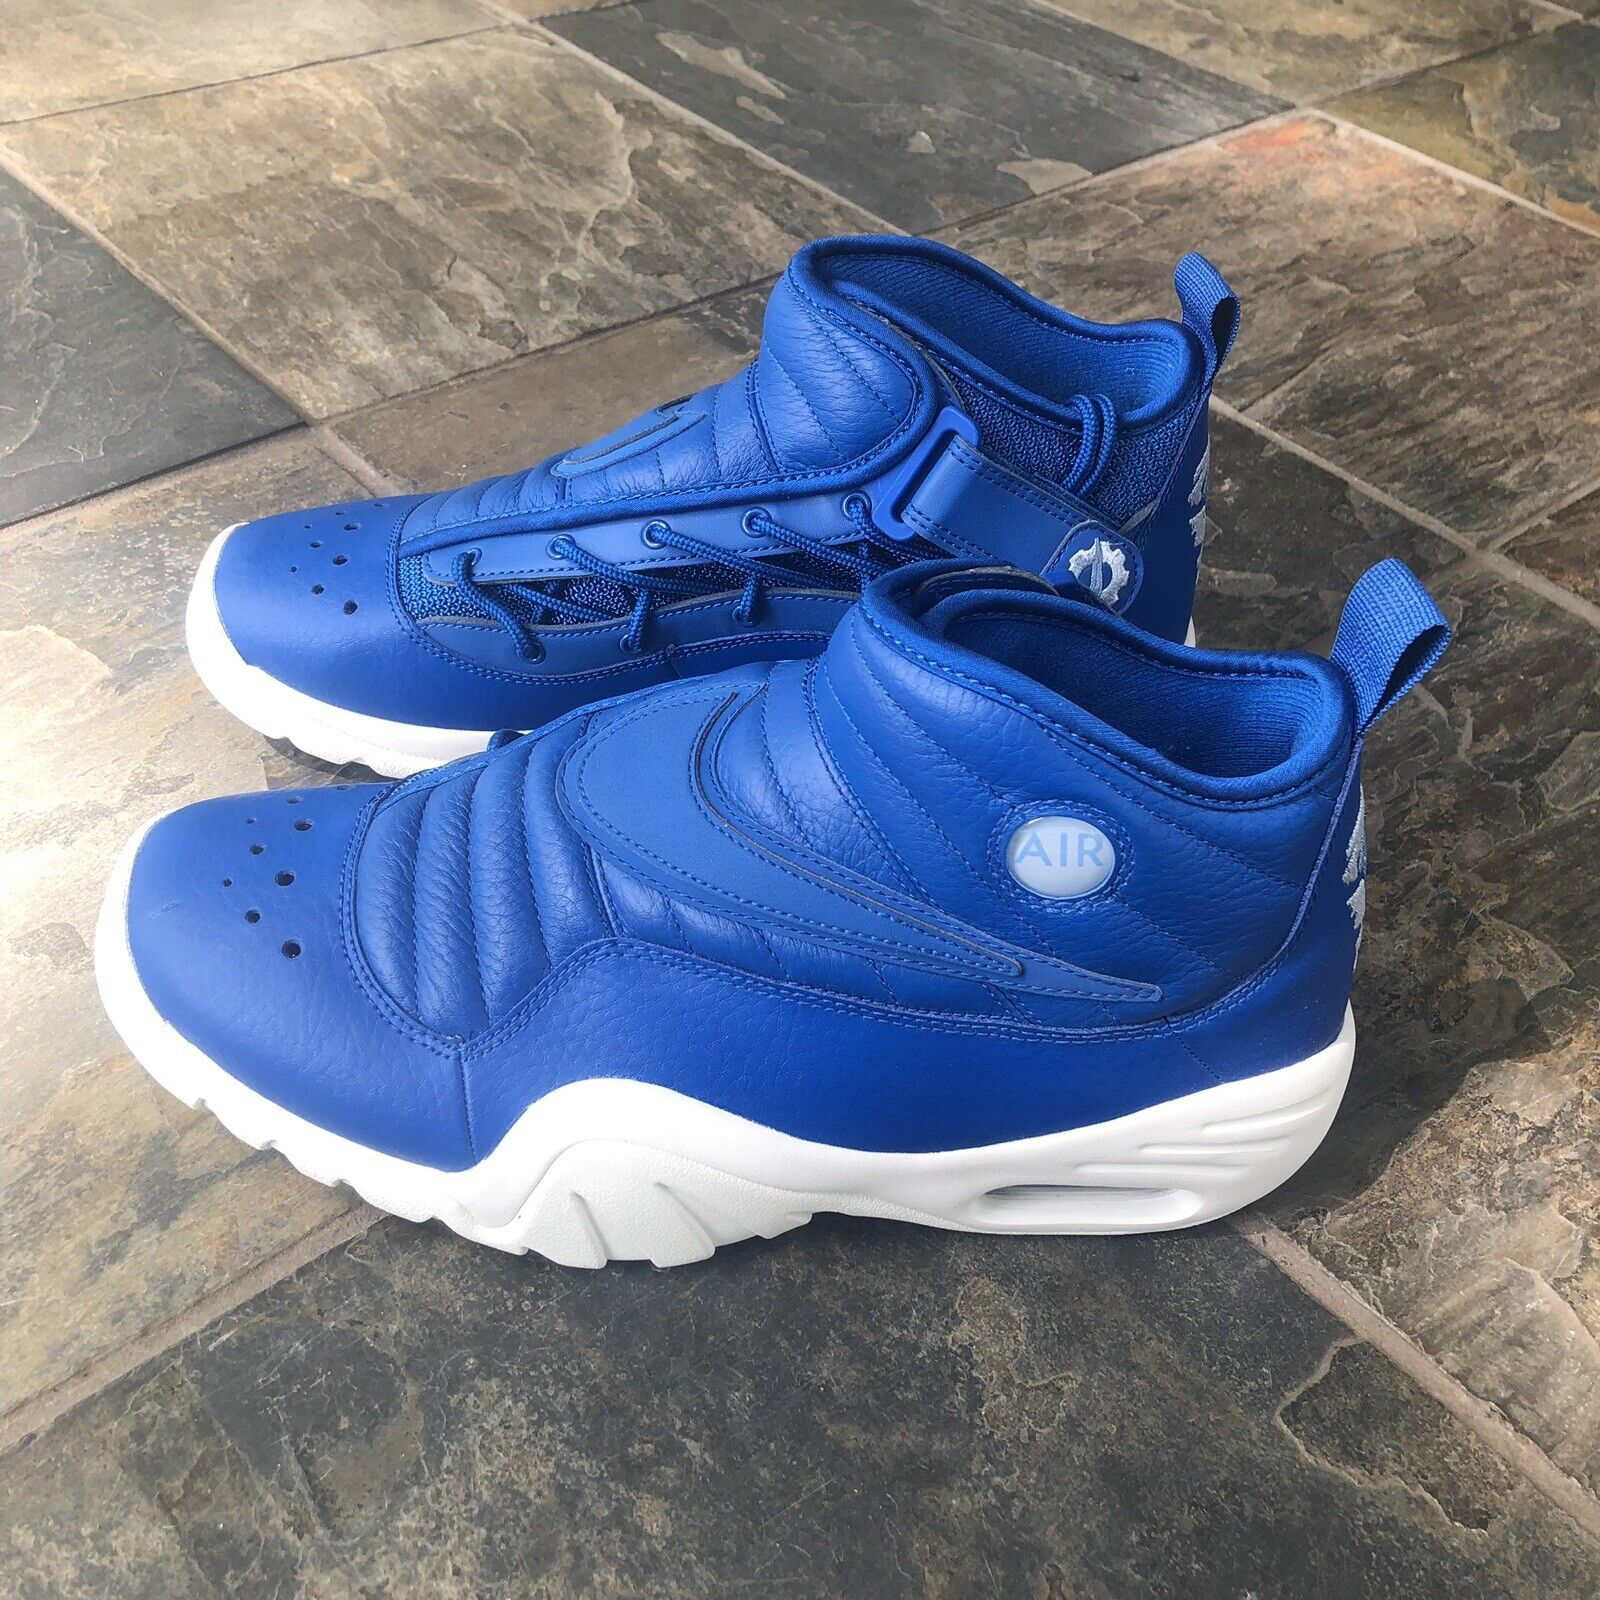 NEW Nike Air Shake NDestrukt Rodman Dennis White blueee 880869-401 Jordan Size 13